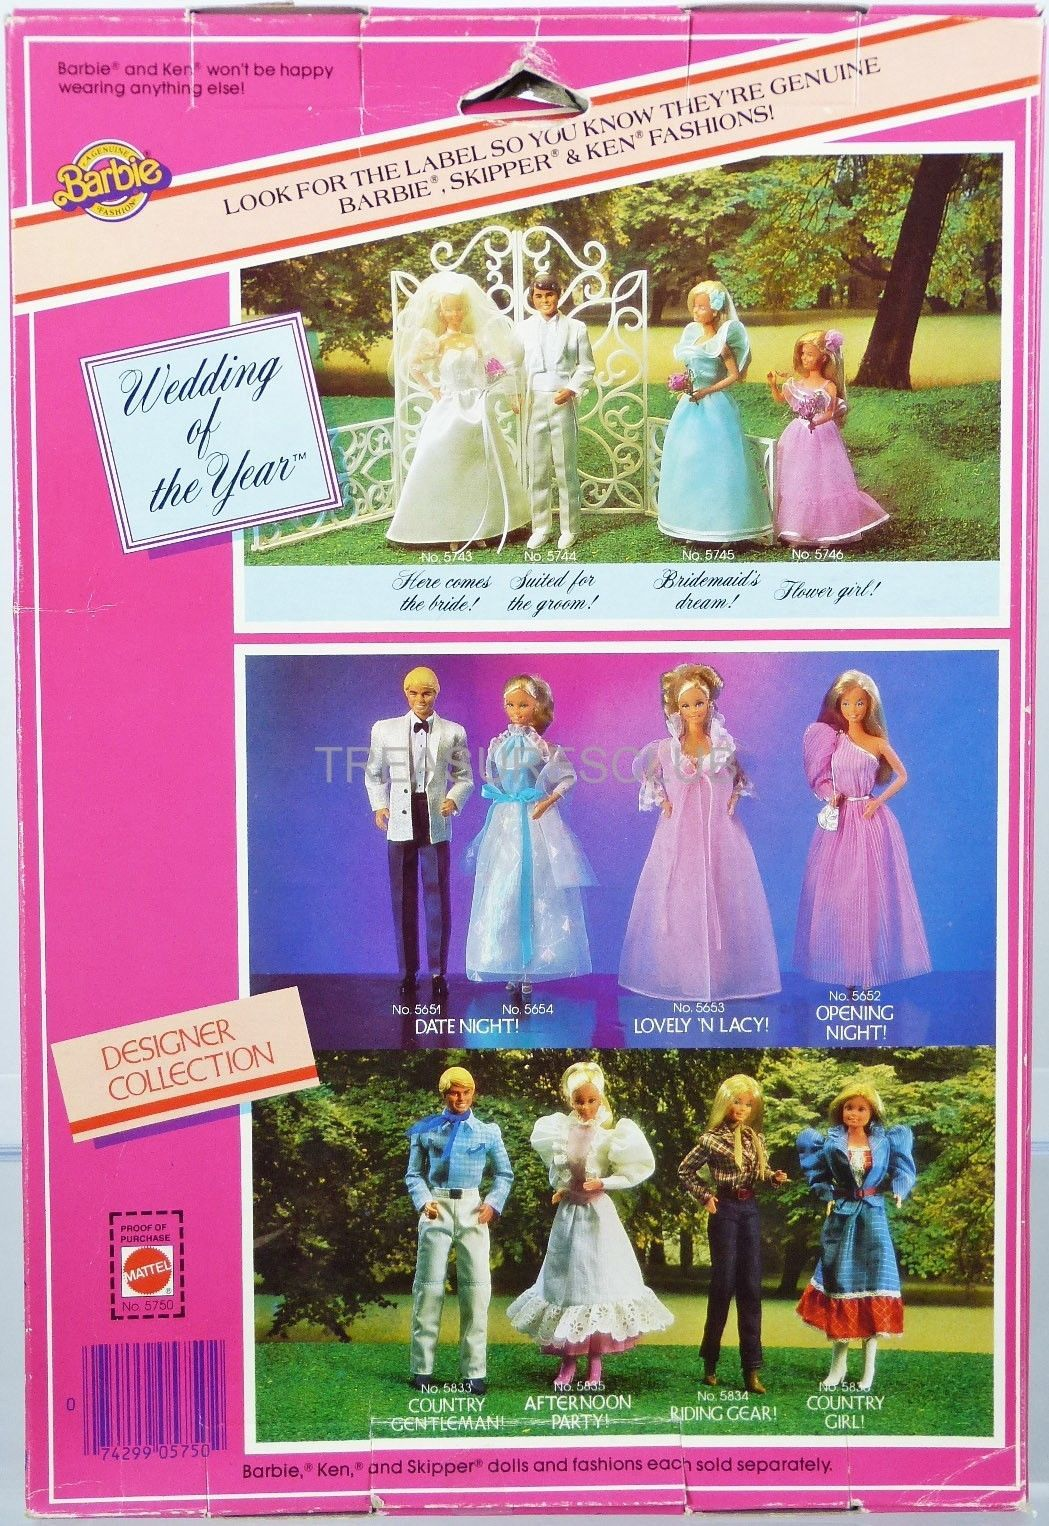 Skipper Barbie Wedding Of The Year Flower Girl 5746 New In Pack 1982 Mattel 3 Wedding Of The Year Barbie Wedding Barbie Bridal